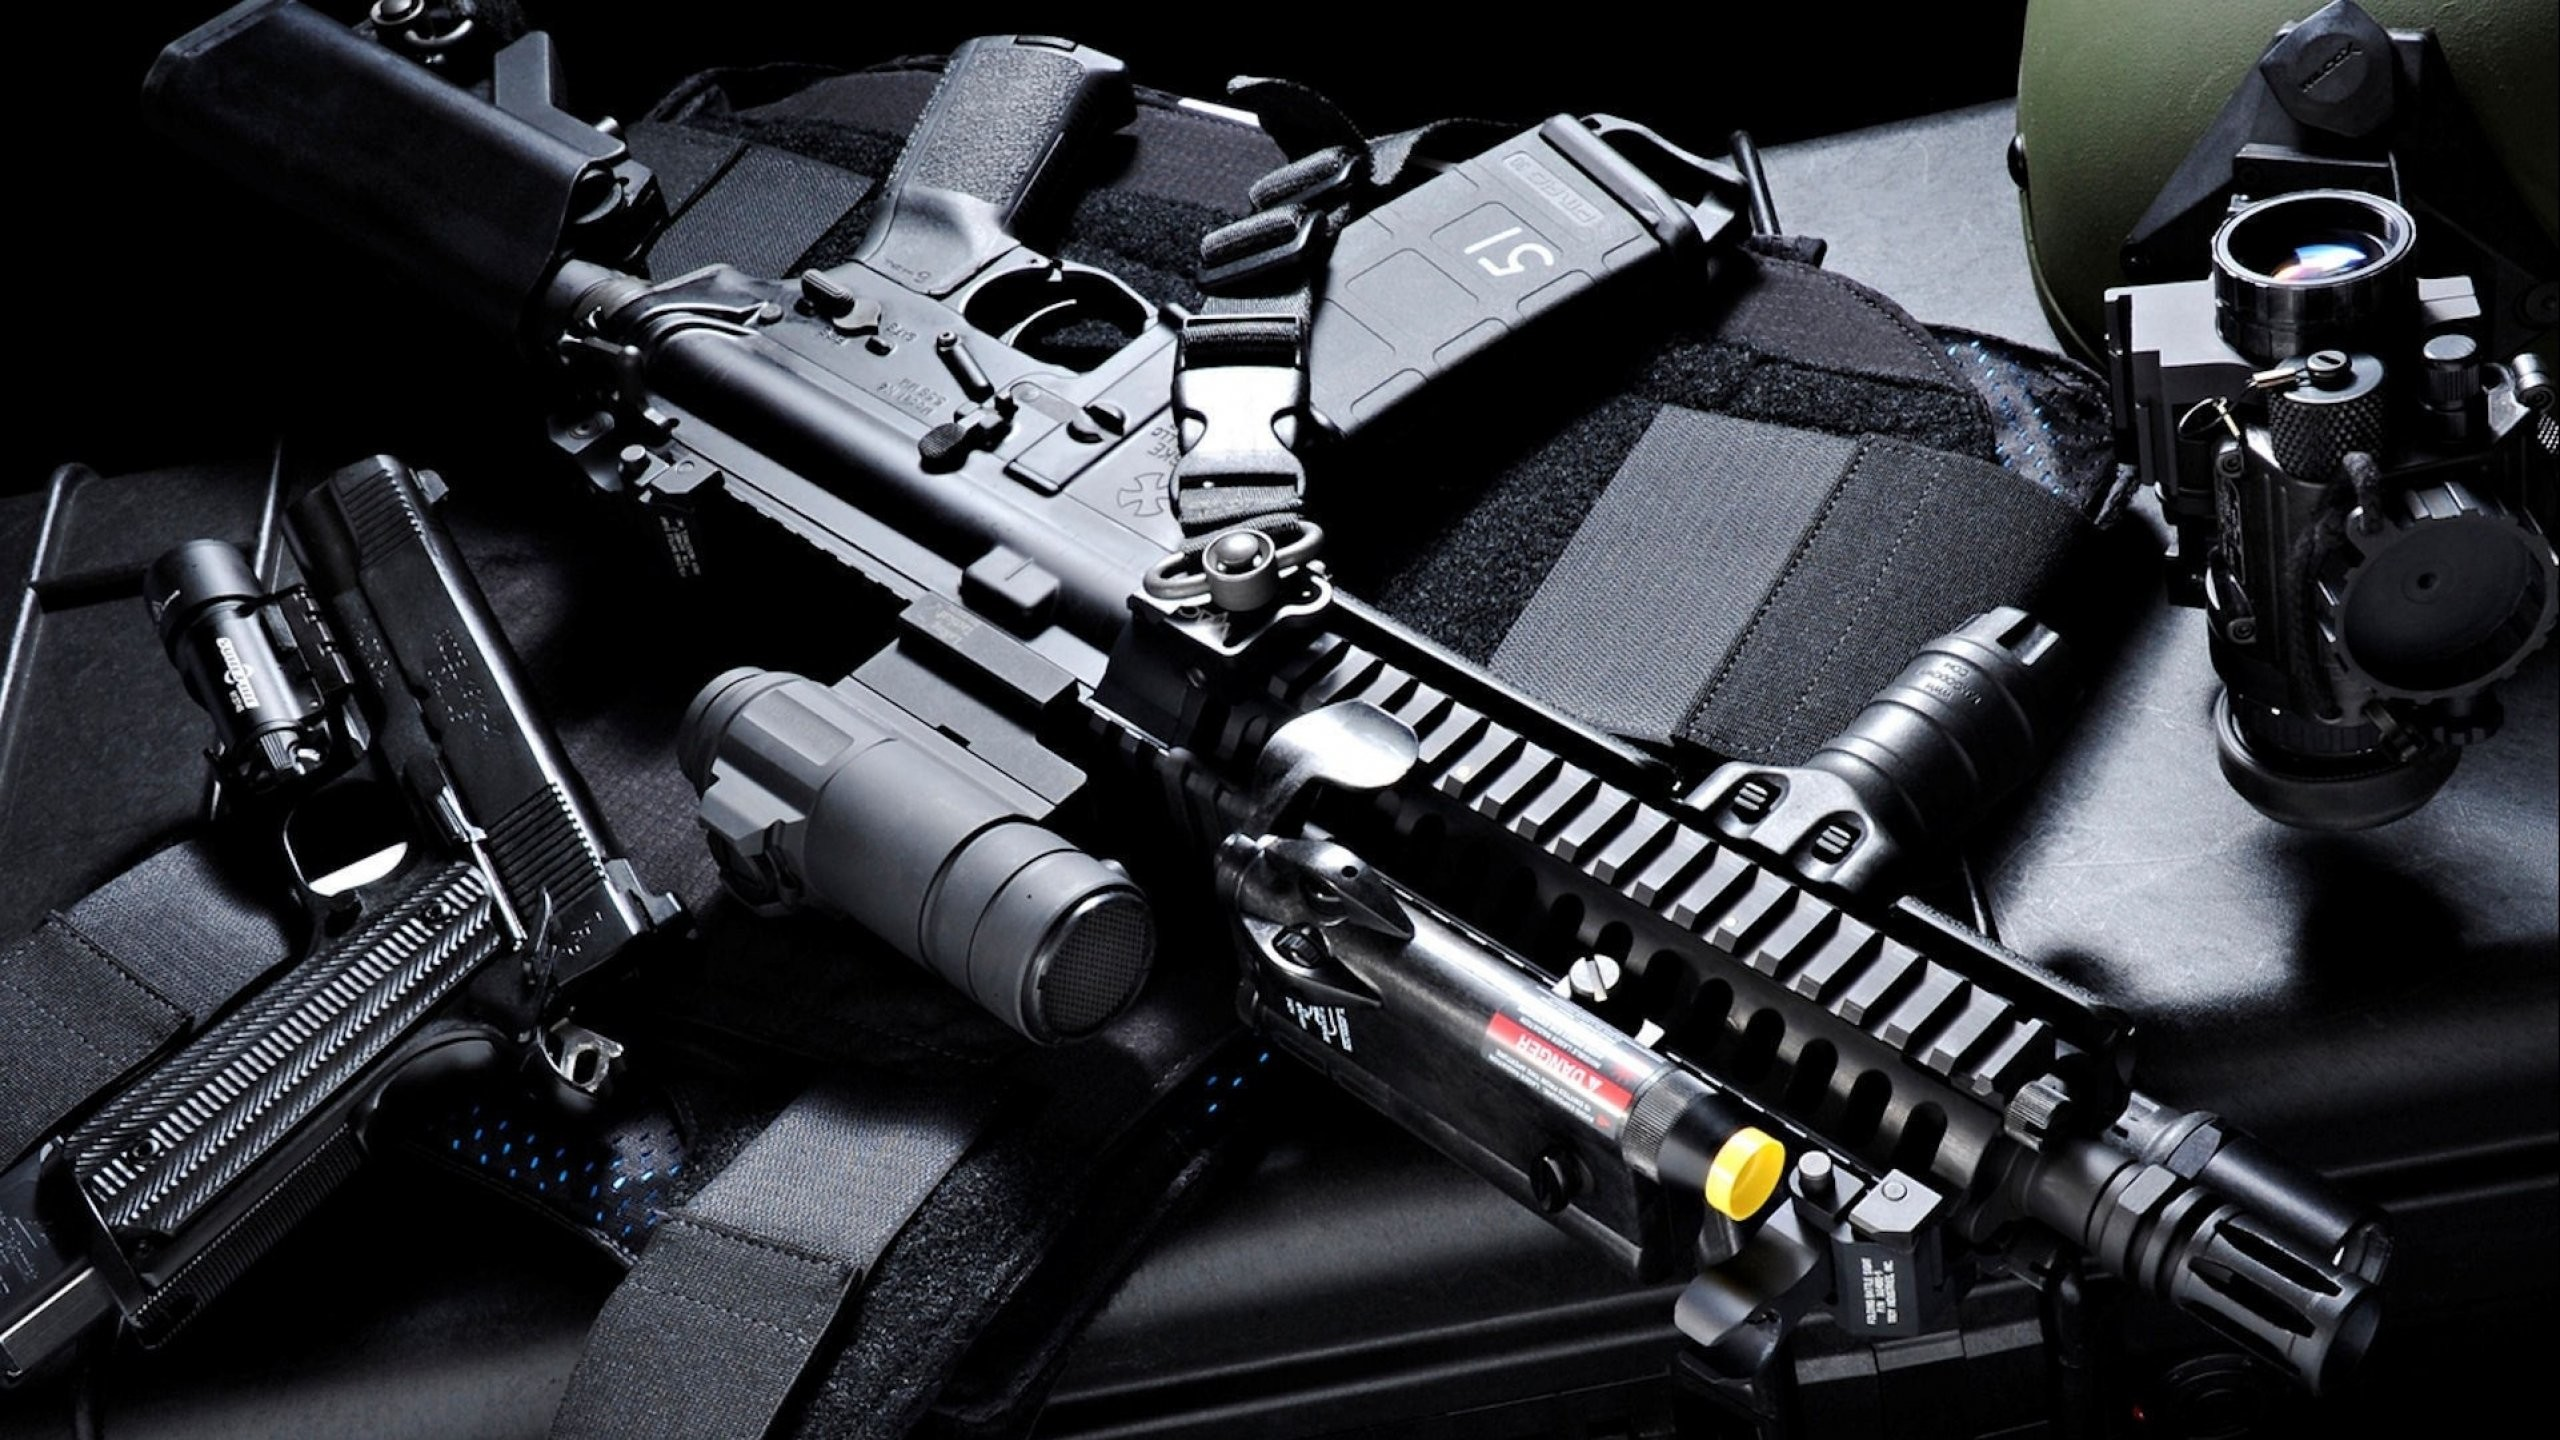 Download-1920×1080-Police-Guns-Gun-Knife-Defense-wallpaper-